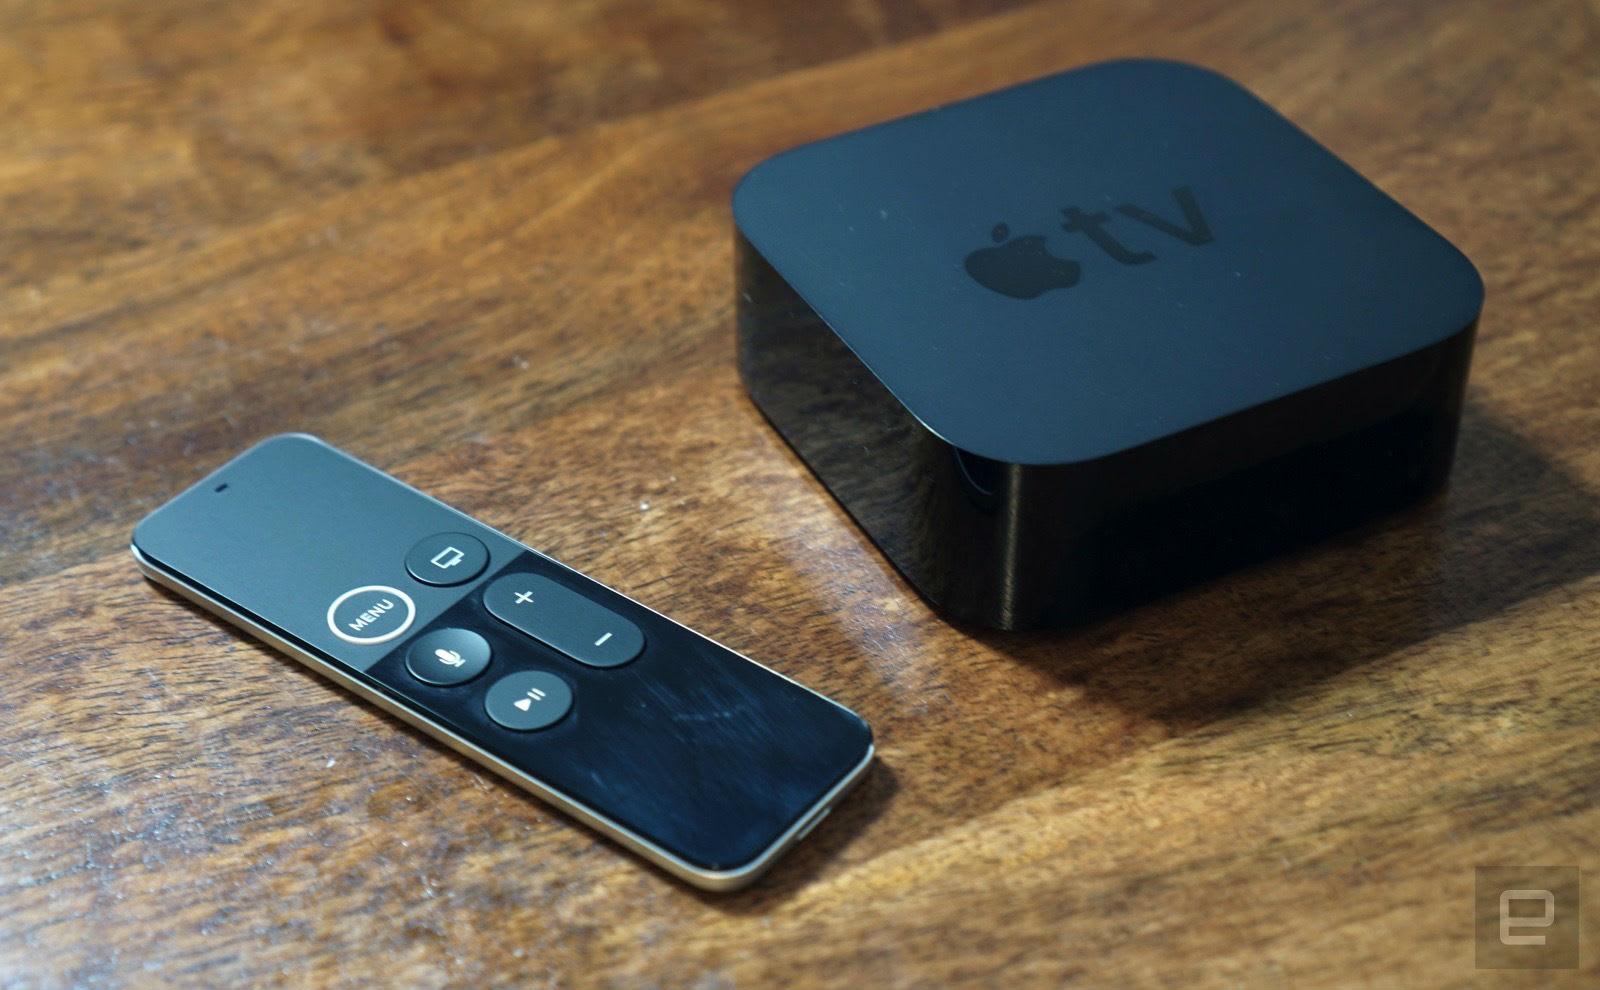 Apple TV 4K update will fix its video output problem | Engadget